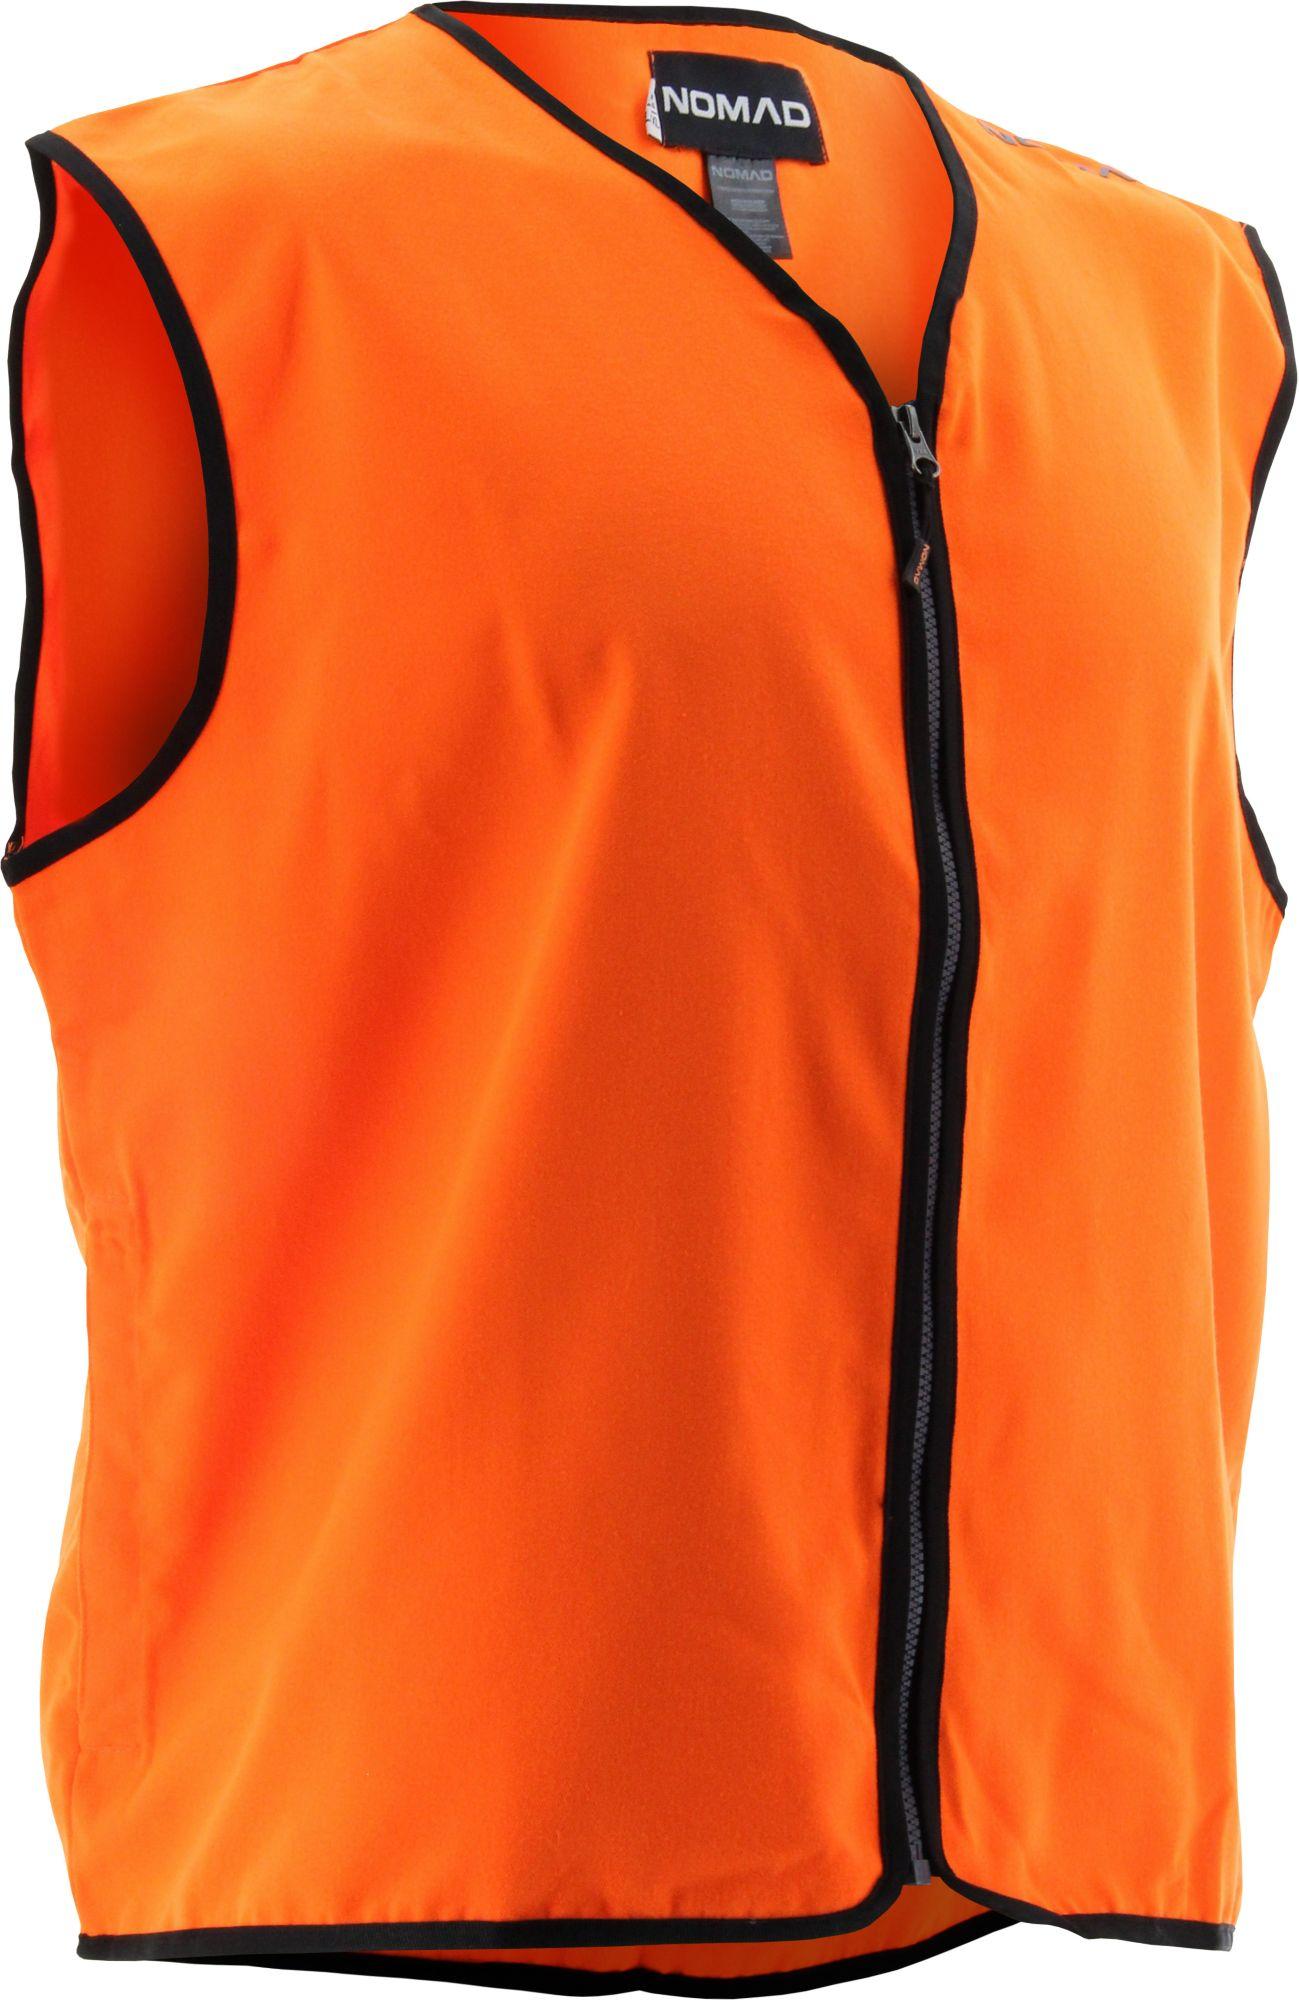 NOMAD Men's Blaze Hunting Vest, Size: L/XL, Blaze Orange thumbnail